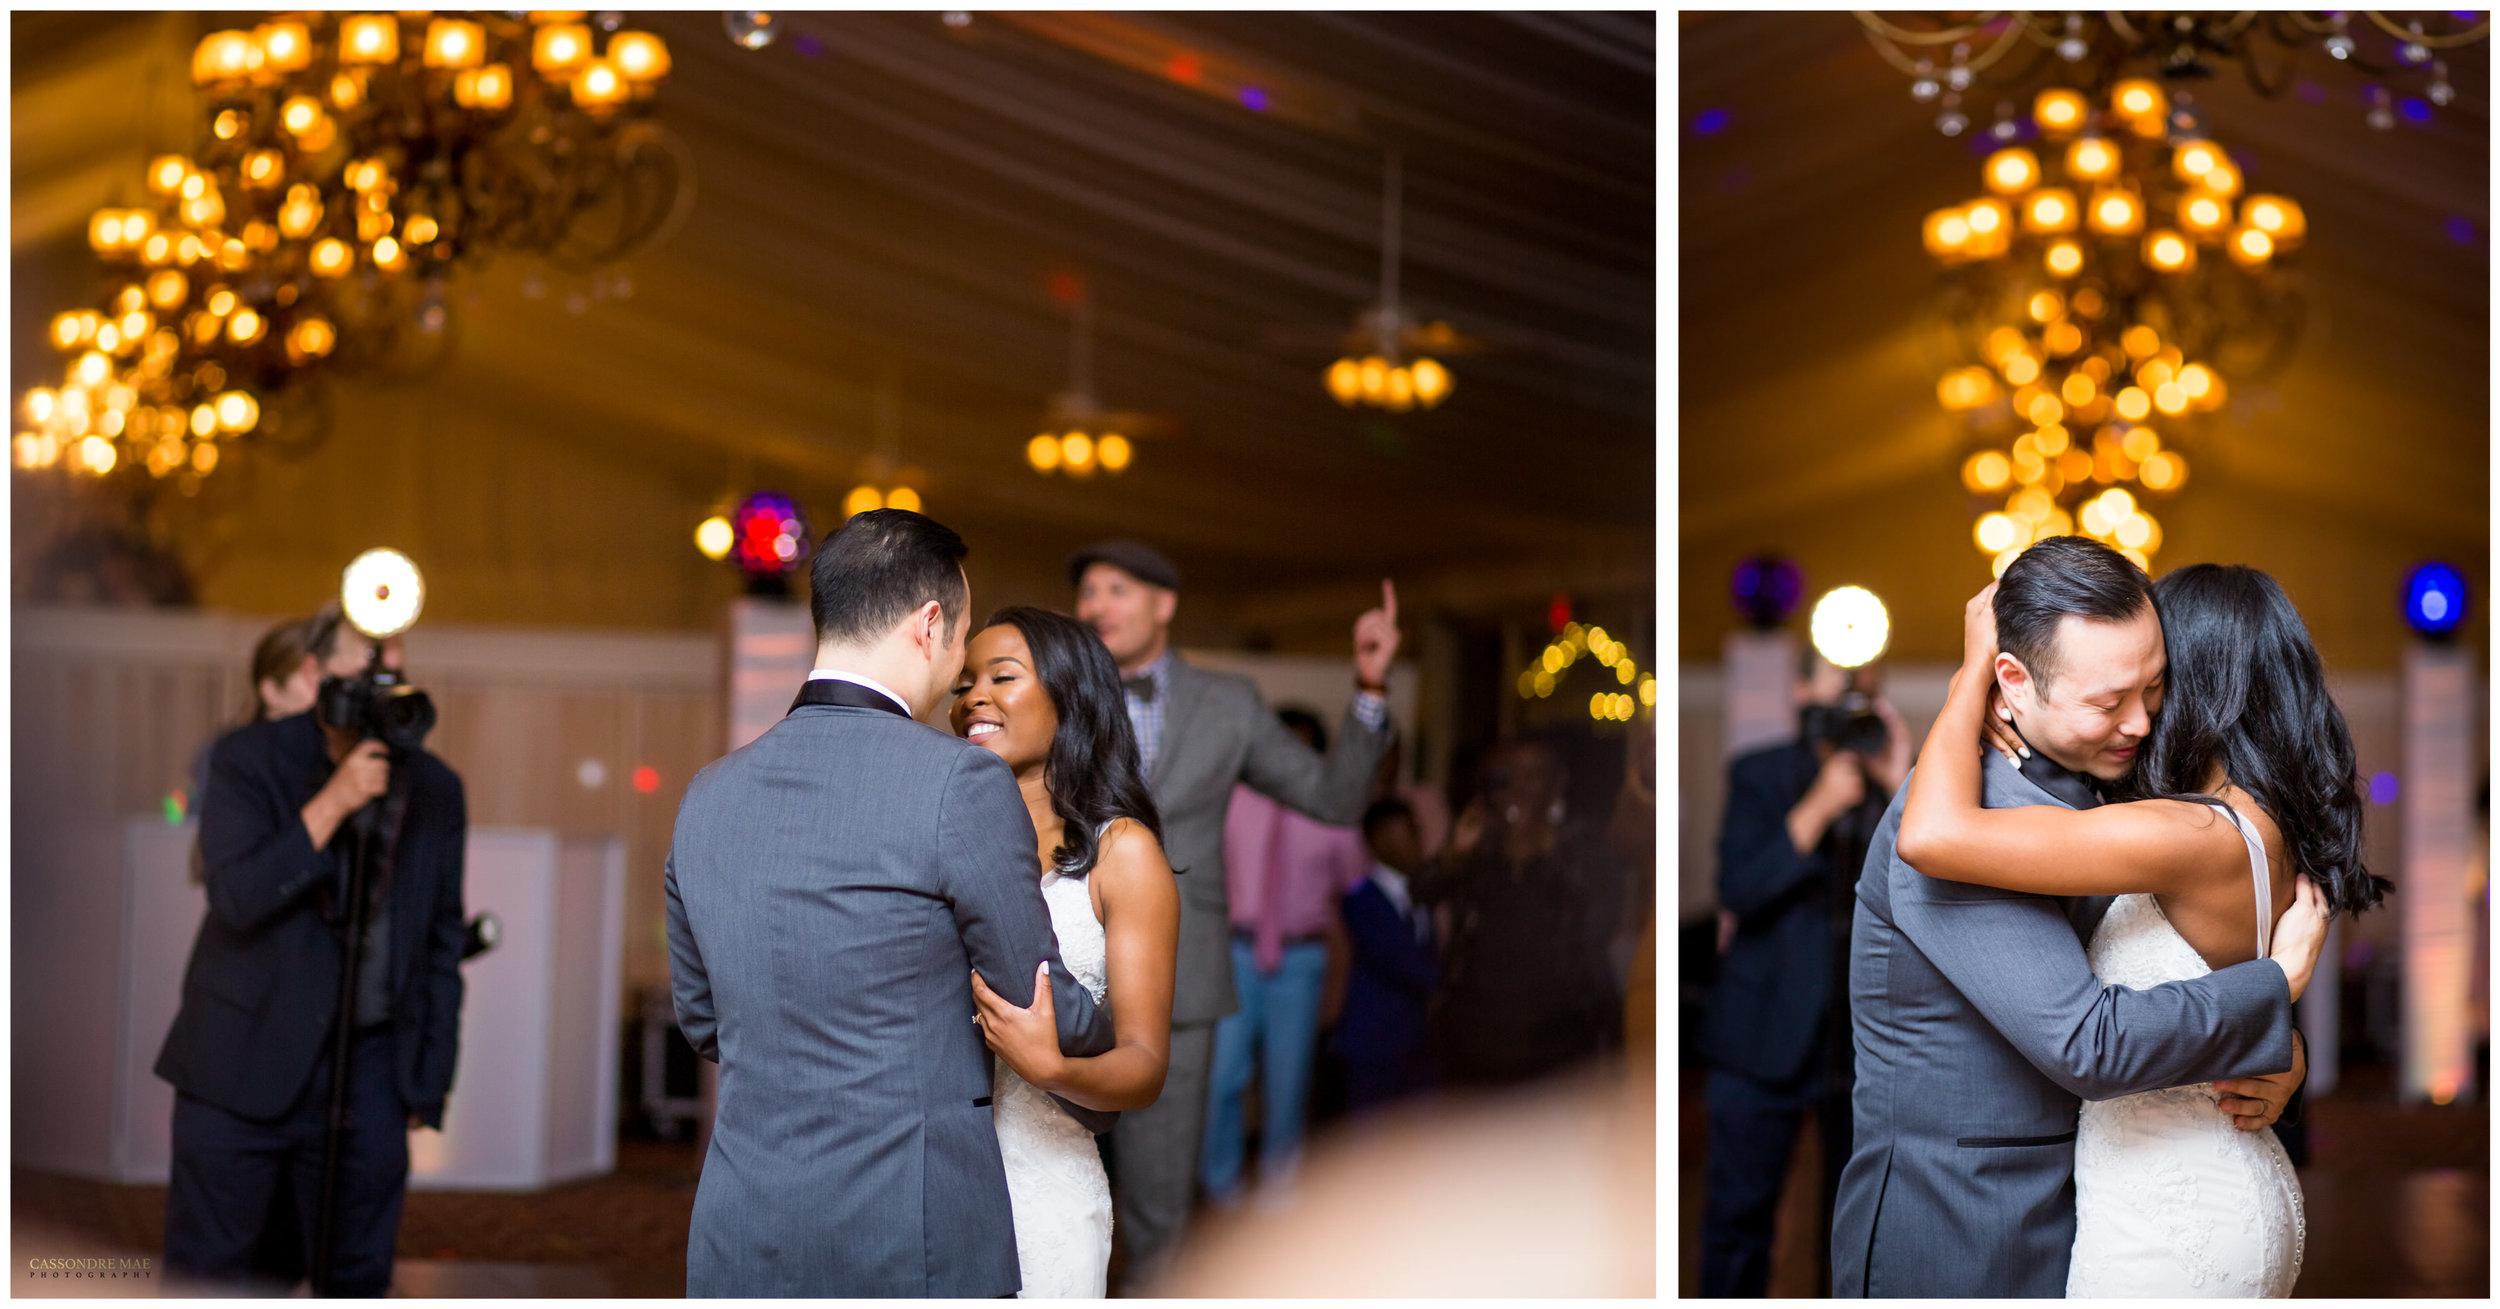 West Hills Country Club Wedding Photos Cassondre Mae Photography 24.jpg